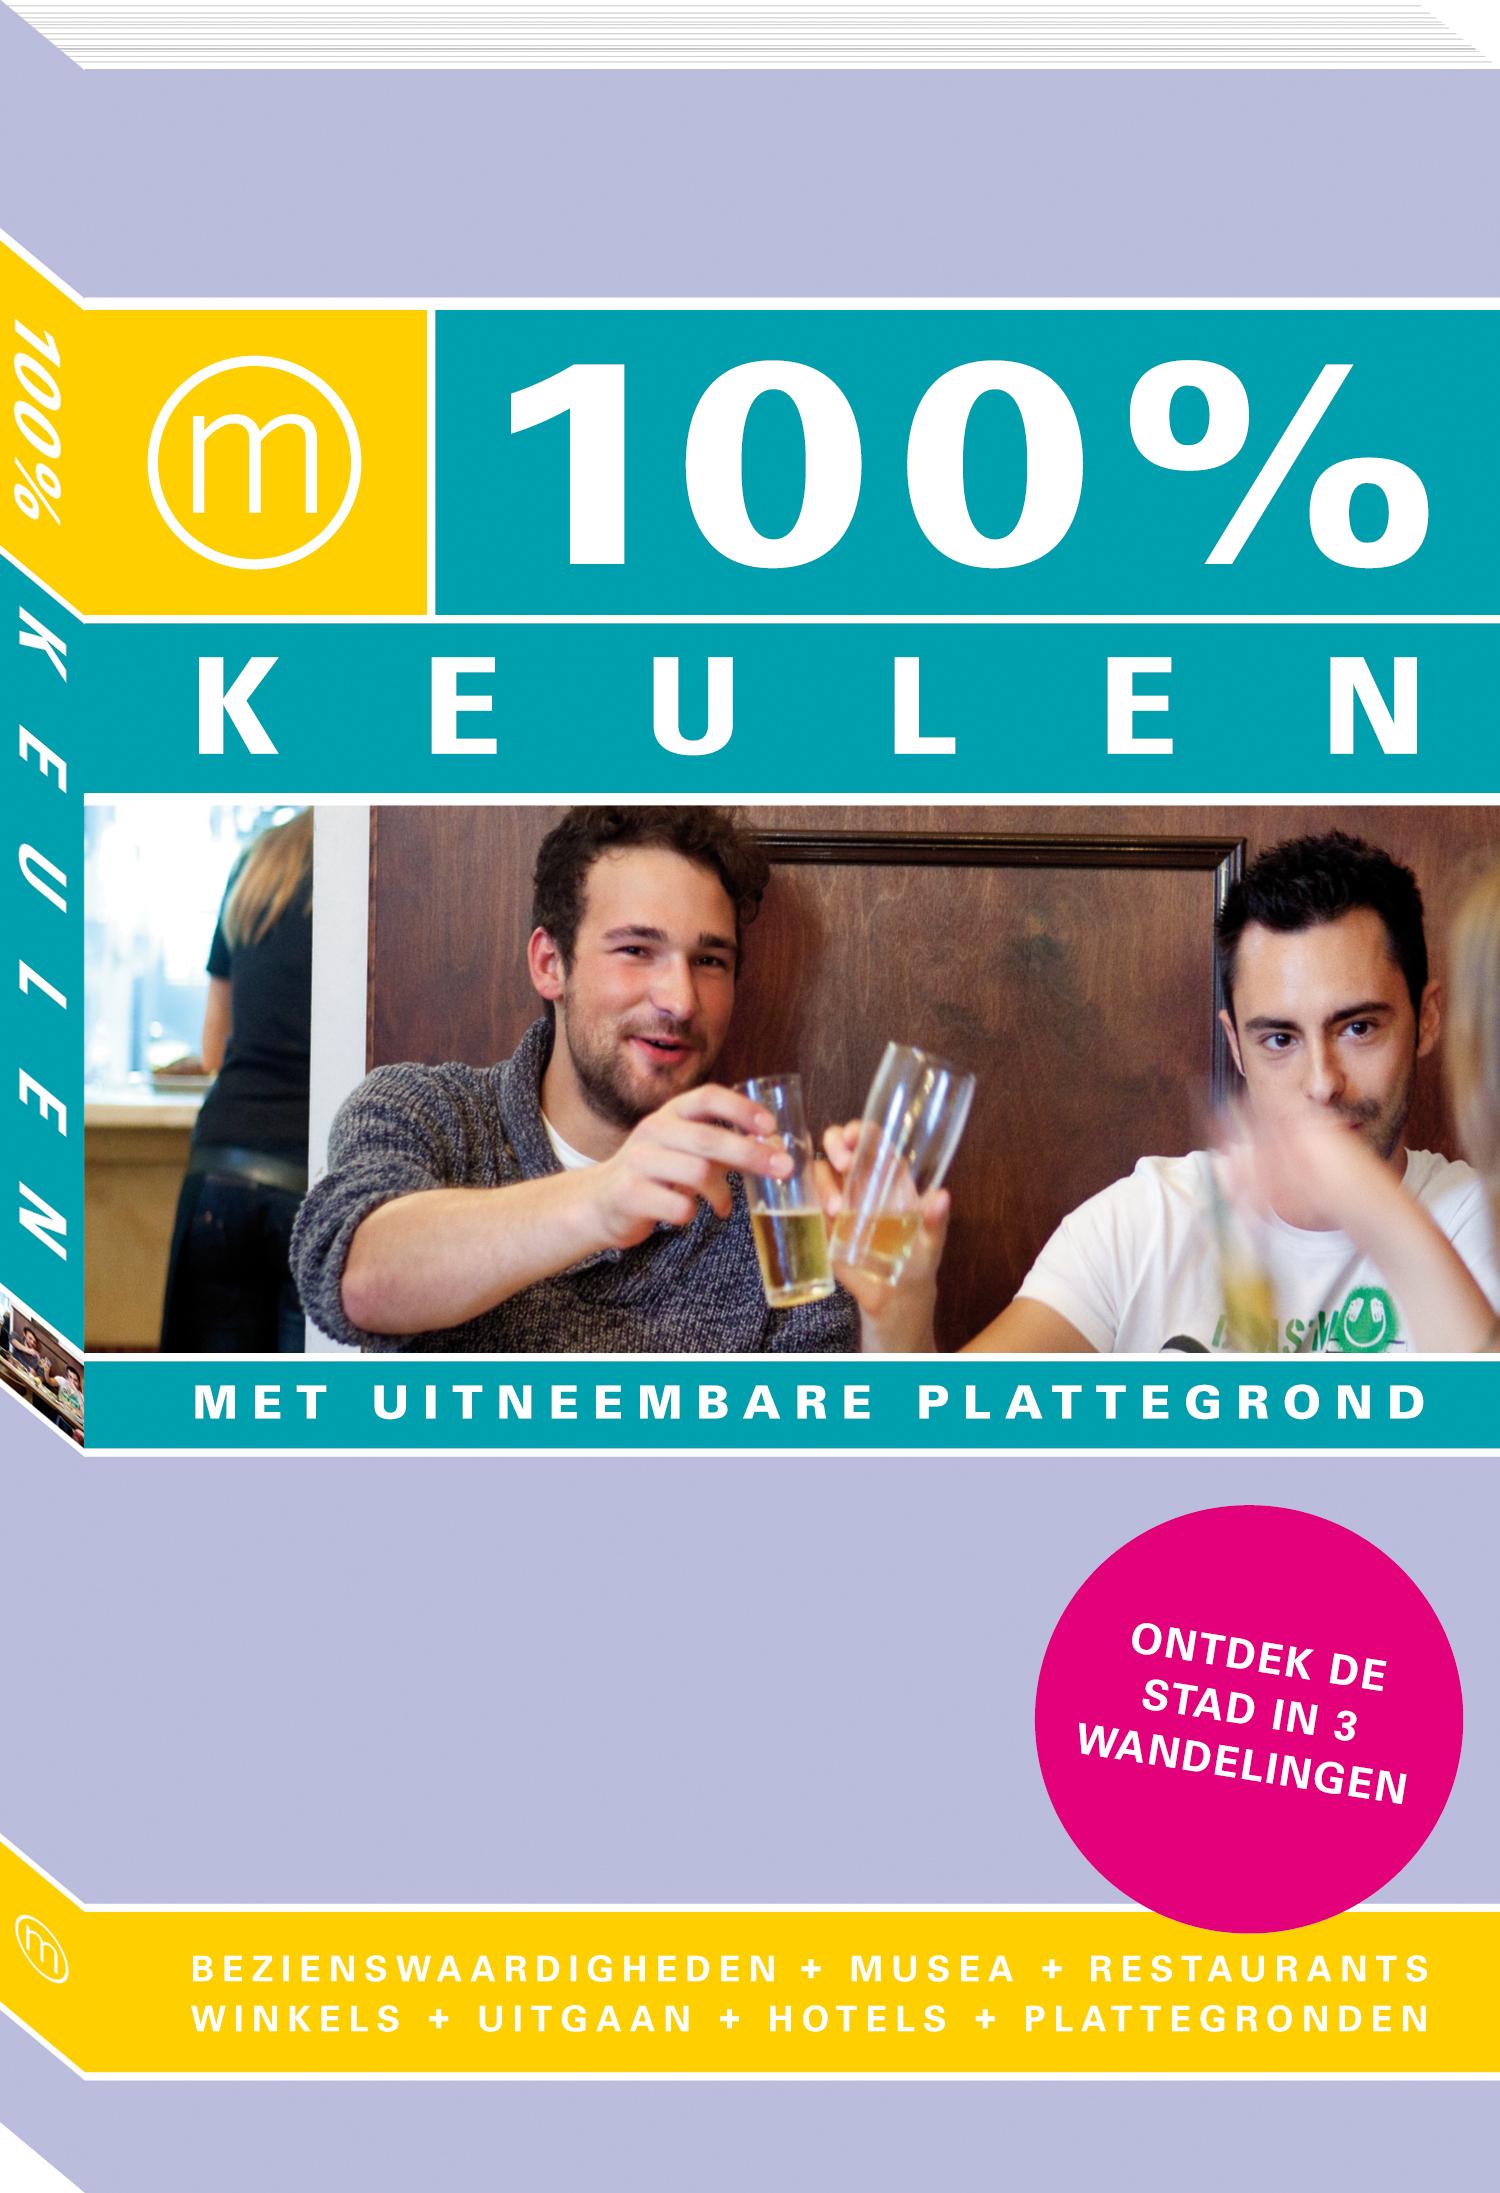 KEULEN_12_NL_COVER.indd